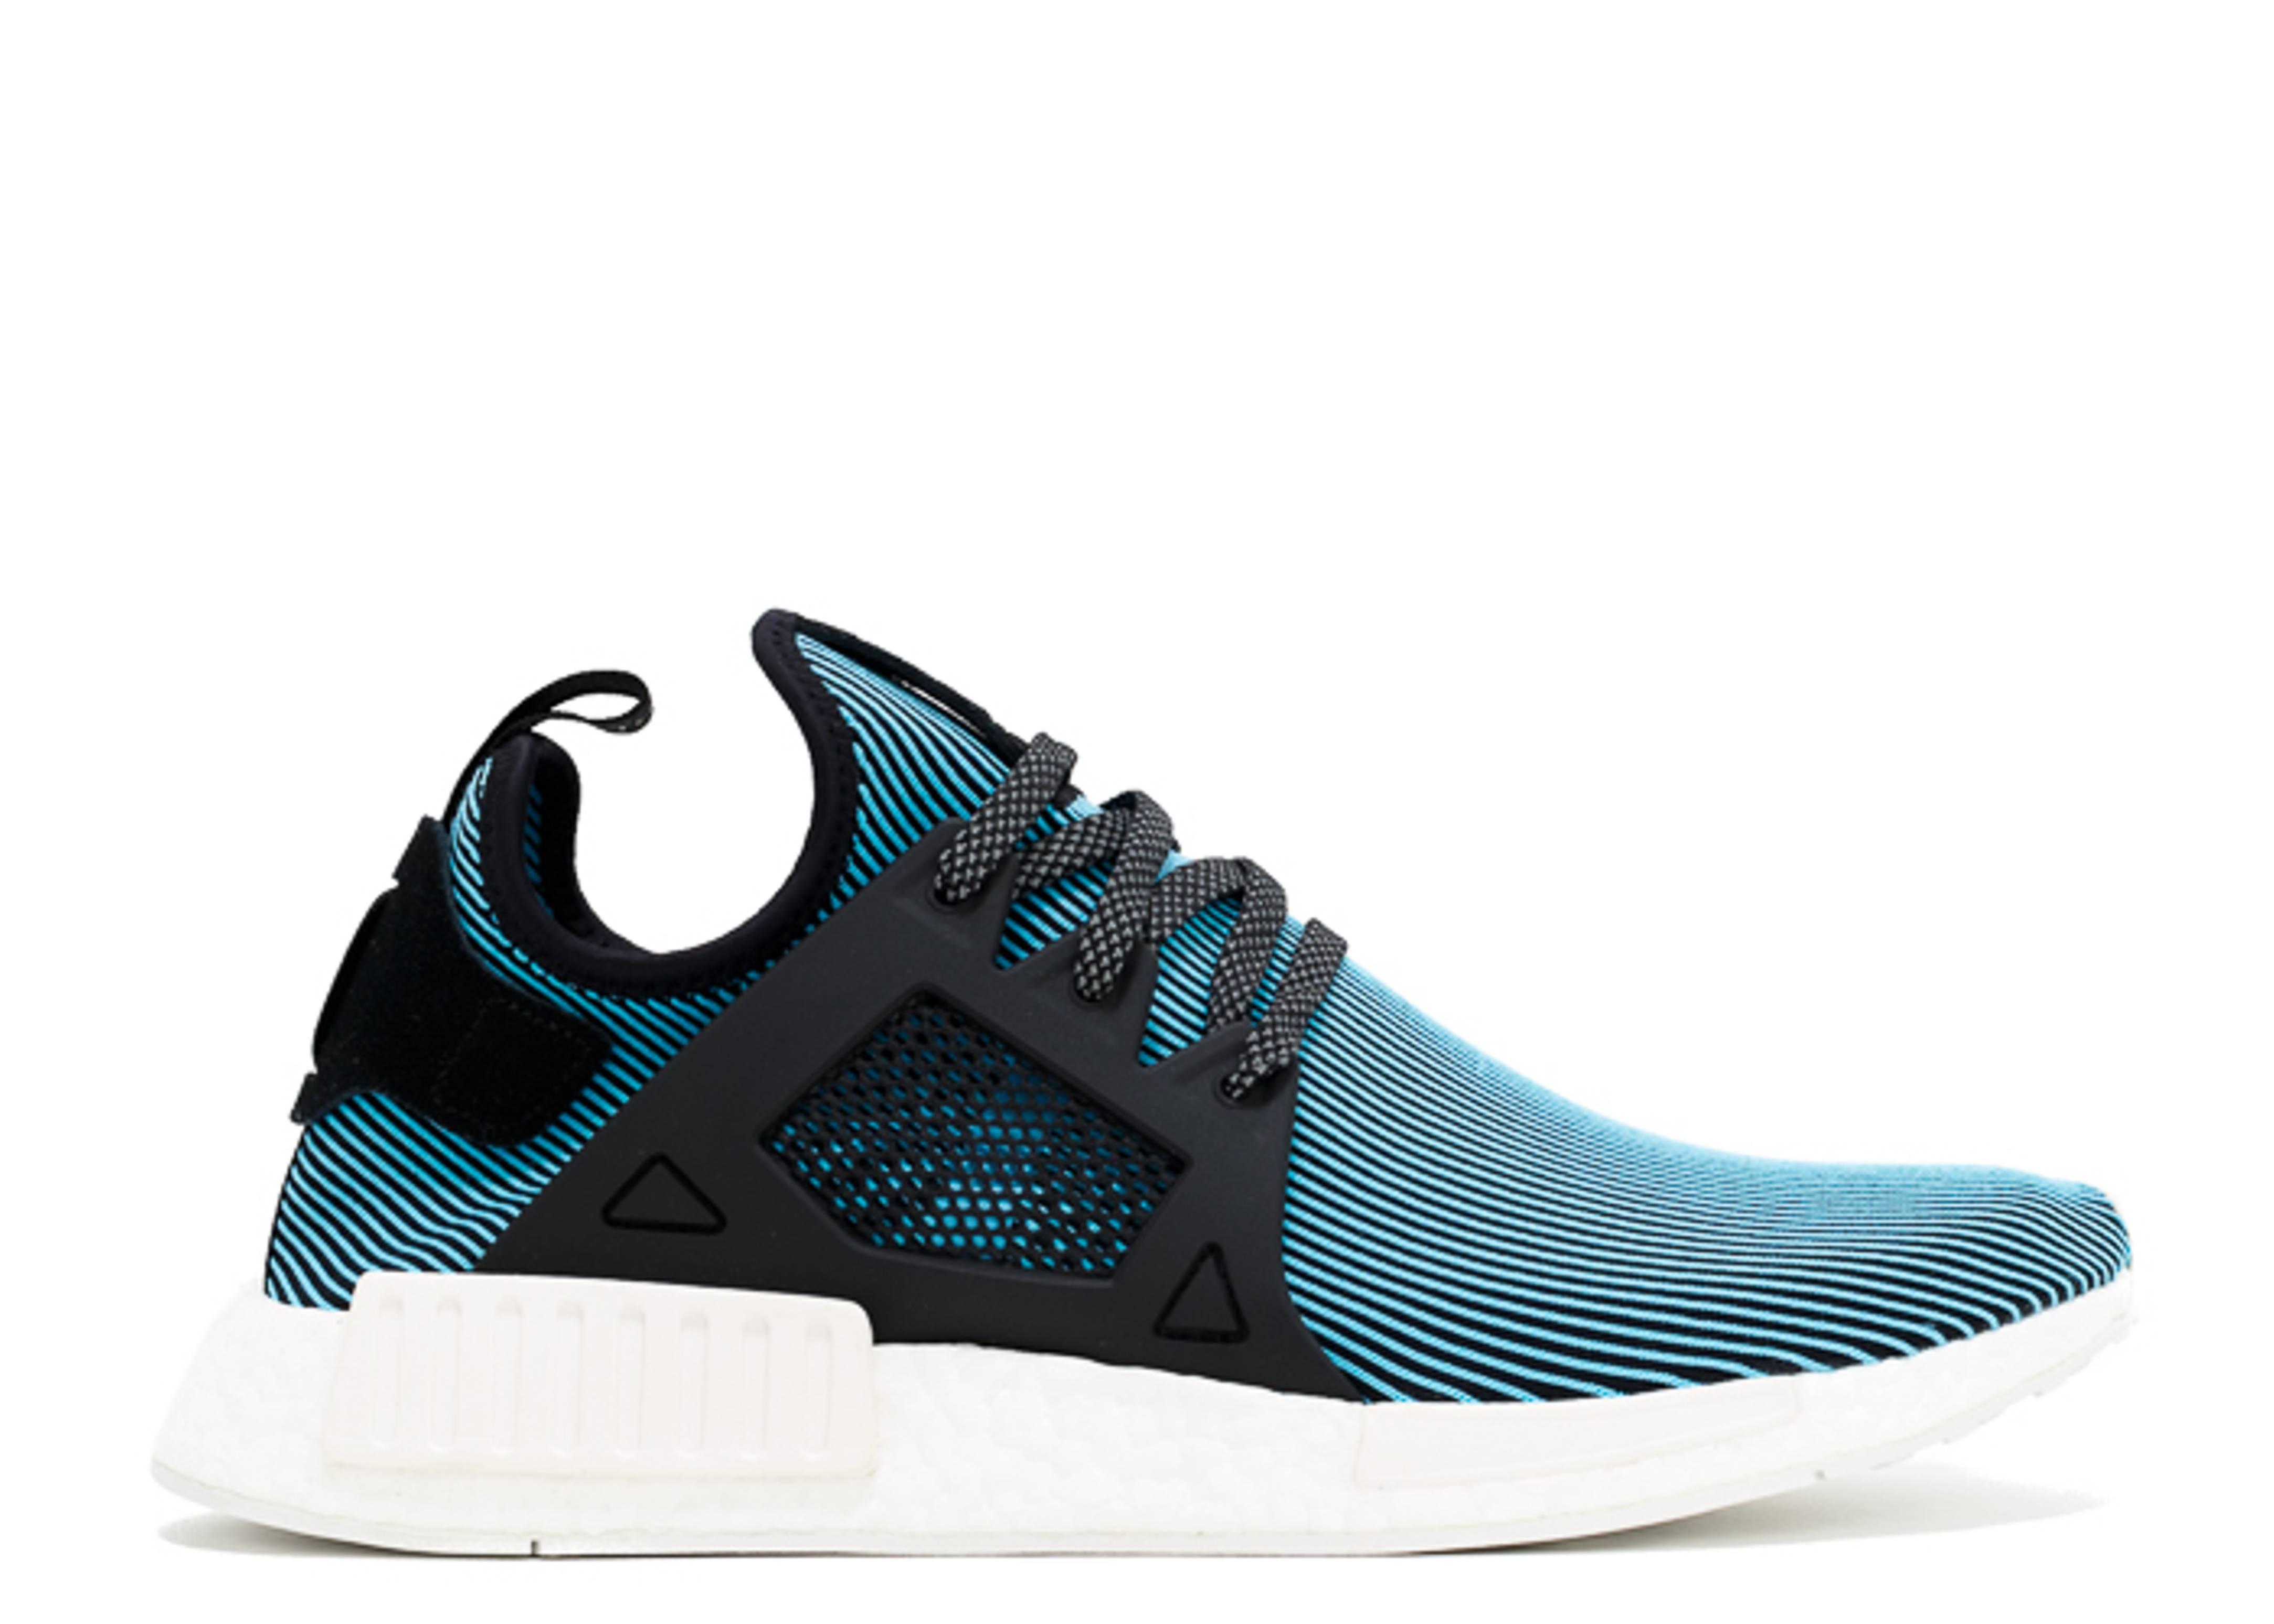 BUY Titolo X Adidas NMD XR1 Trail Celestial